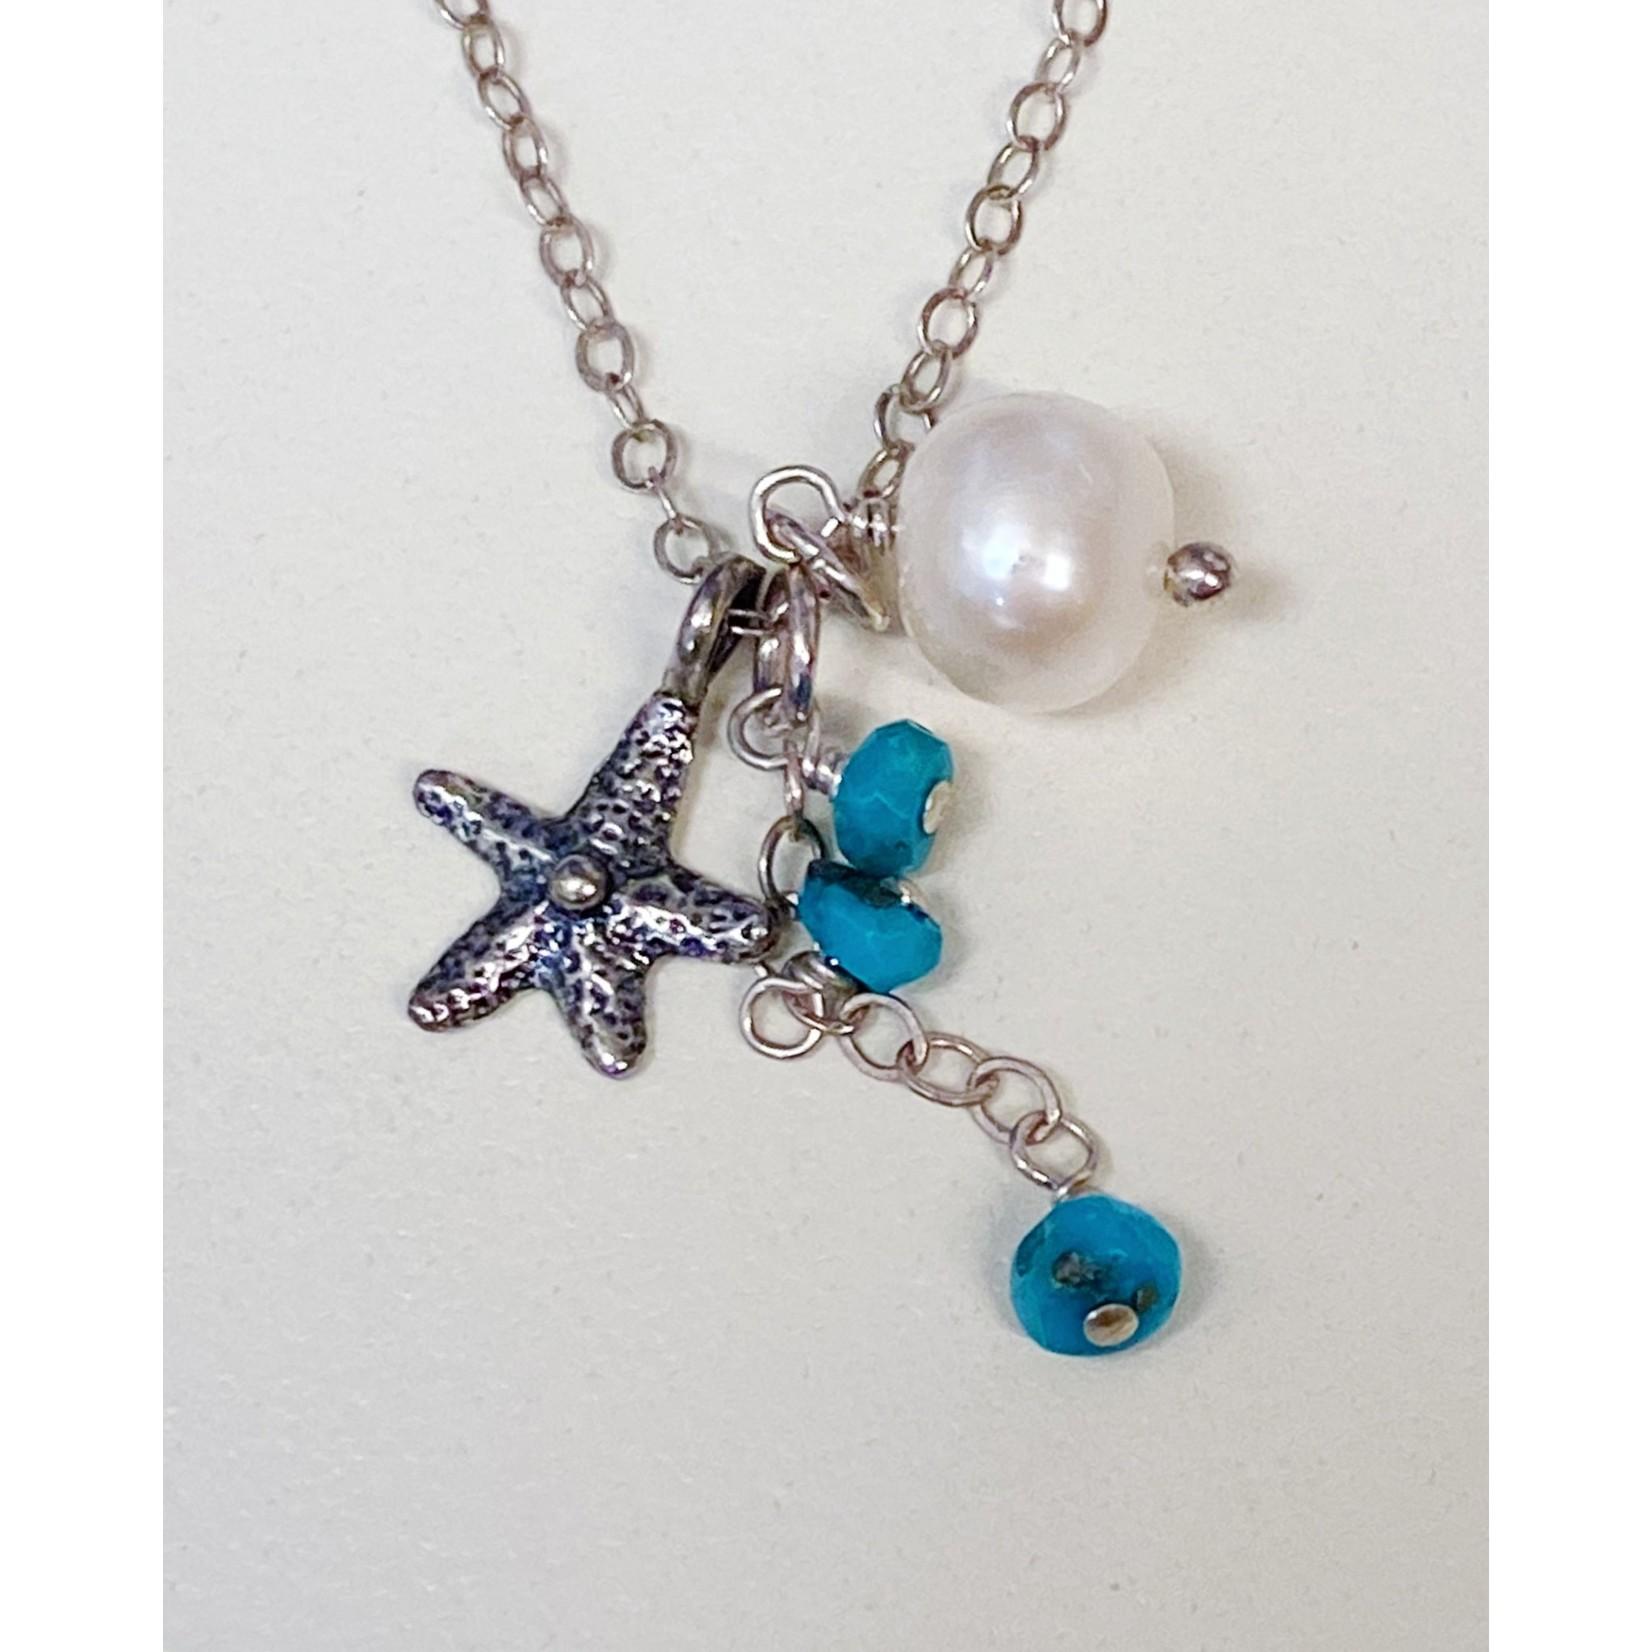 Midori Jewelry SS Starfish Sleeping Beauty Turquoise FW Pearl Necklace